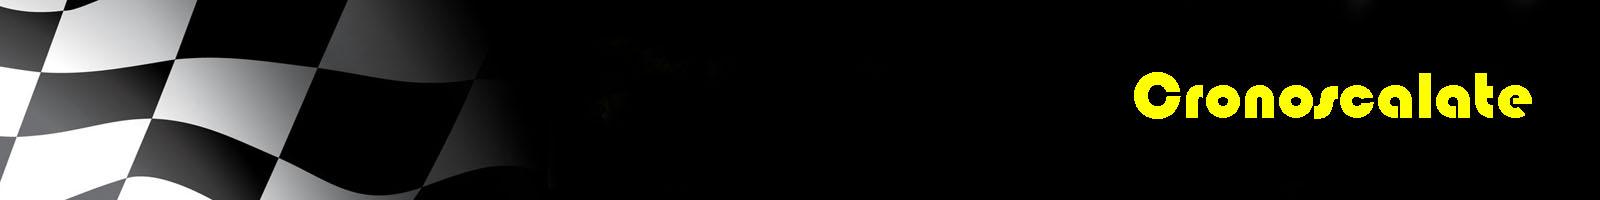 095 - Cronoscalate